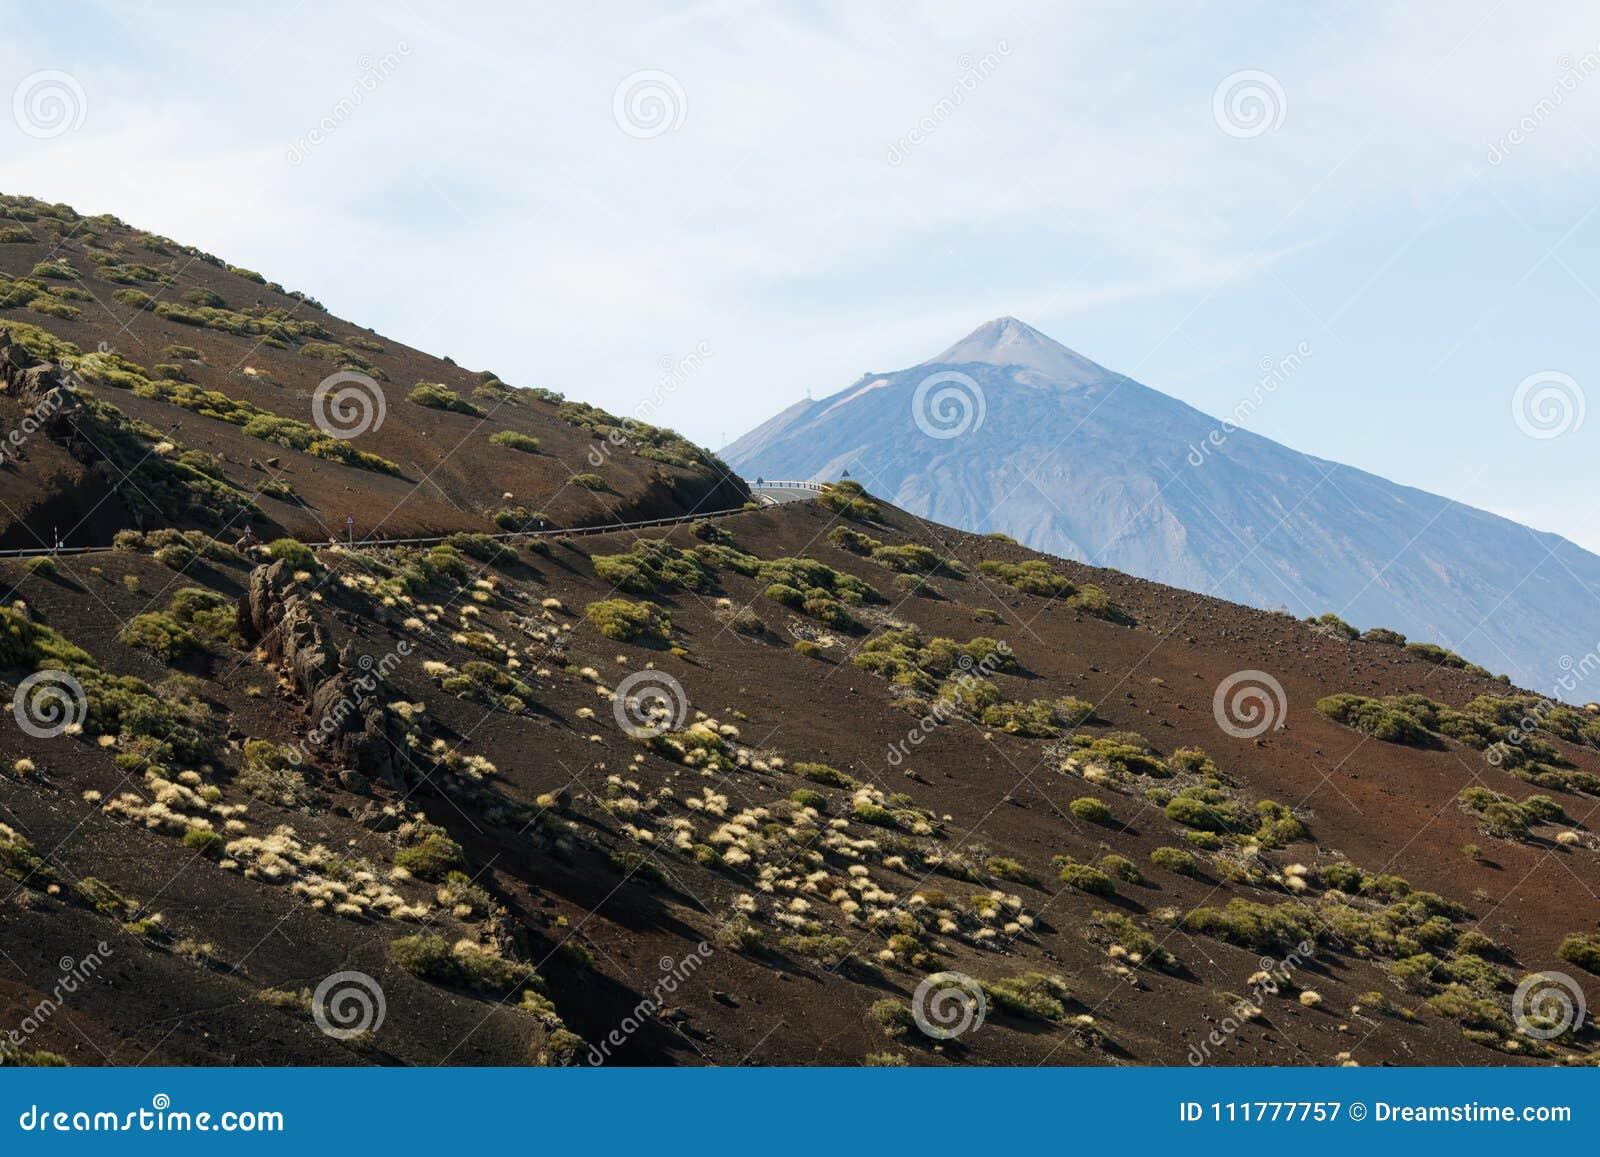 Road to volcano El Teide in Teide National Park